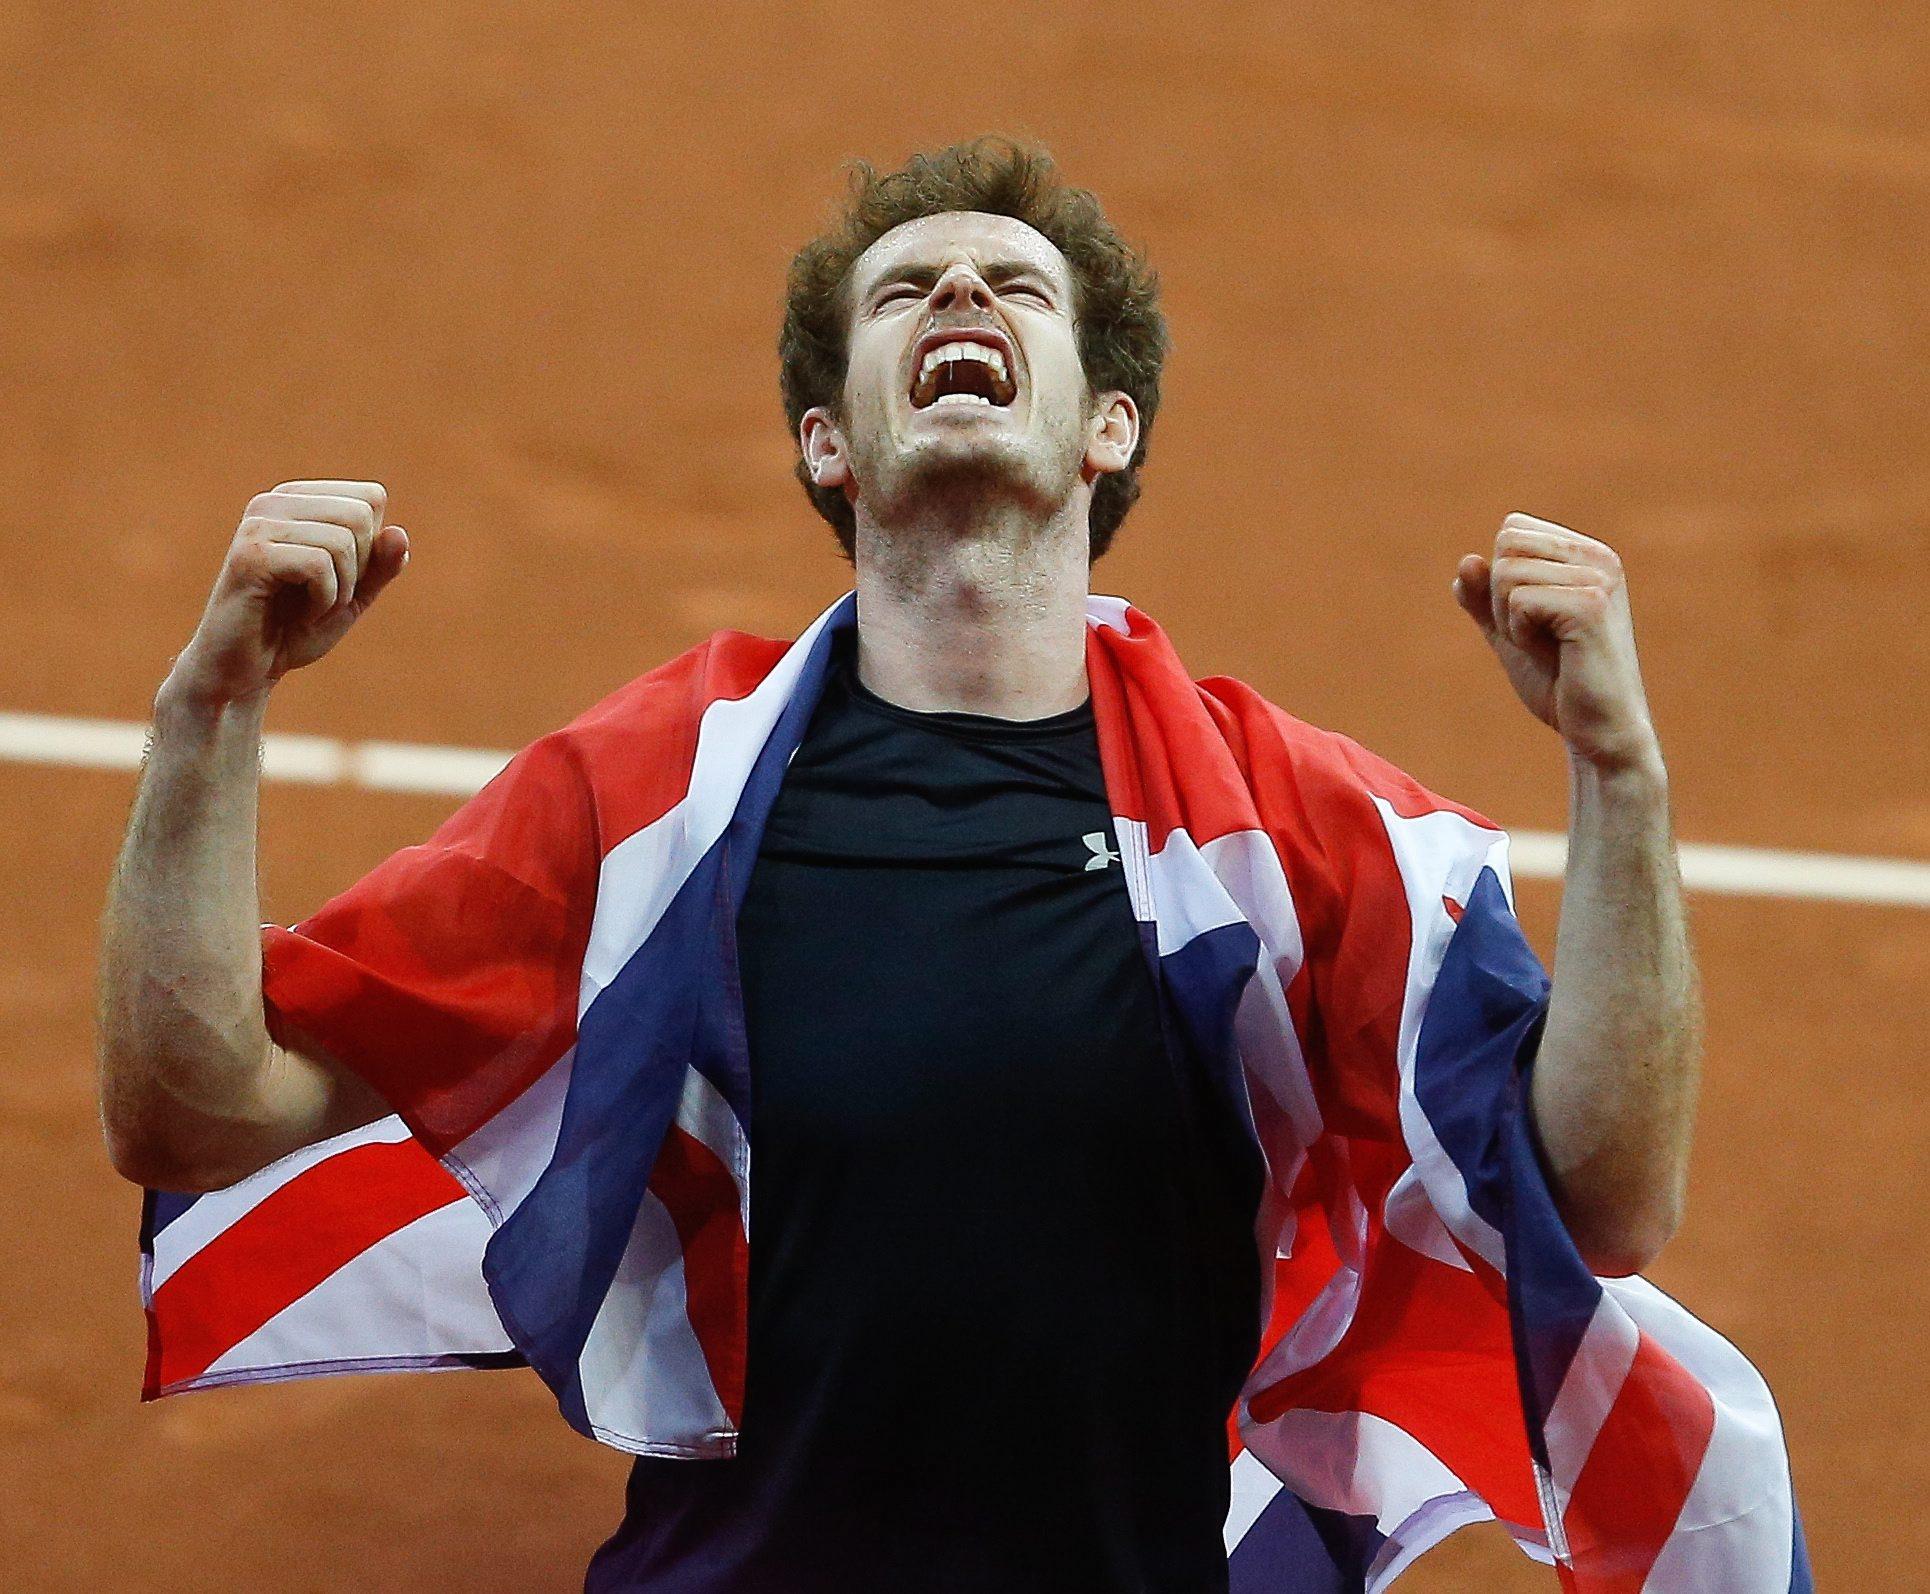 epa05047529 Britain's Andy Murray celebratres winning against Belgium's David Goffin during the Davis Cup World Group Final between Belgium and Britain in Gent, Belgium, 29 November 2015. EPA/LAURENT DUBRULE